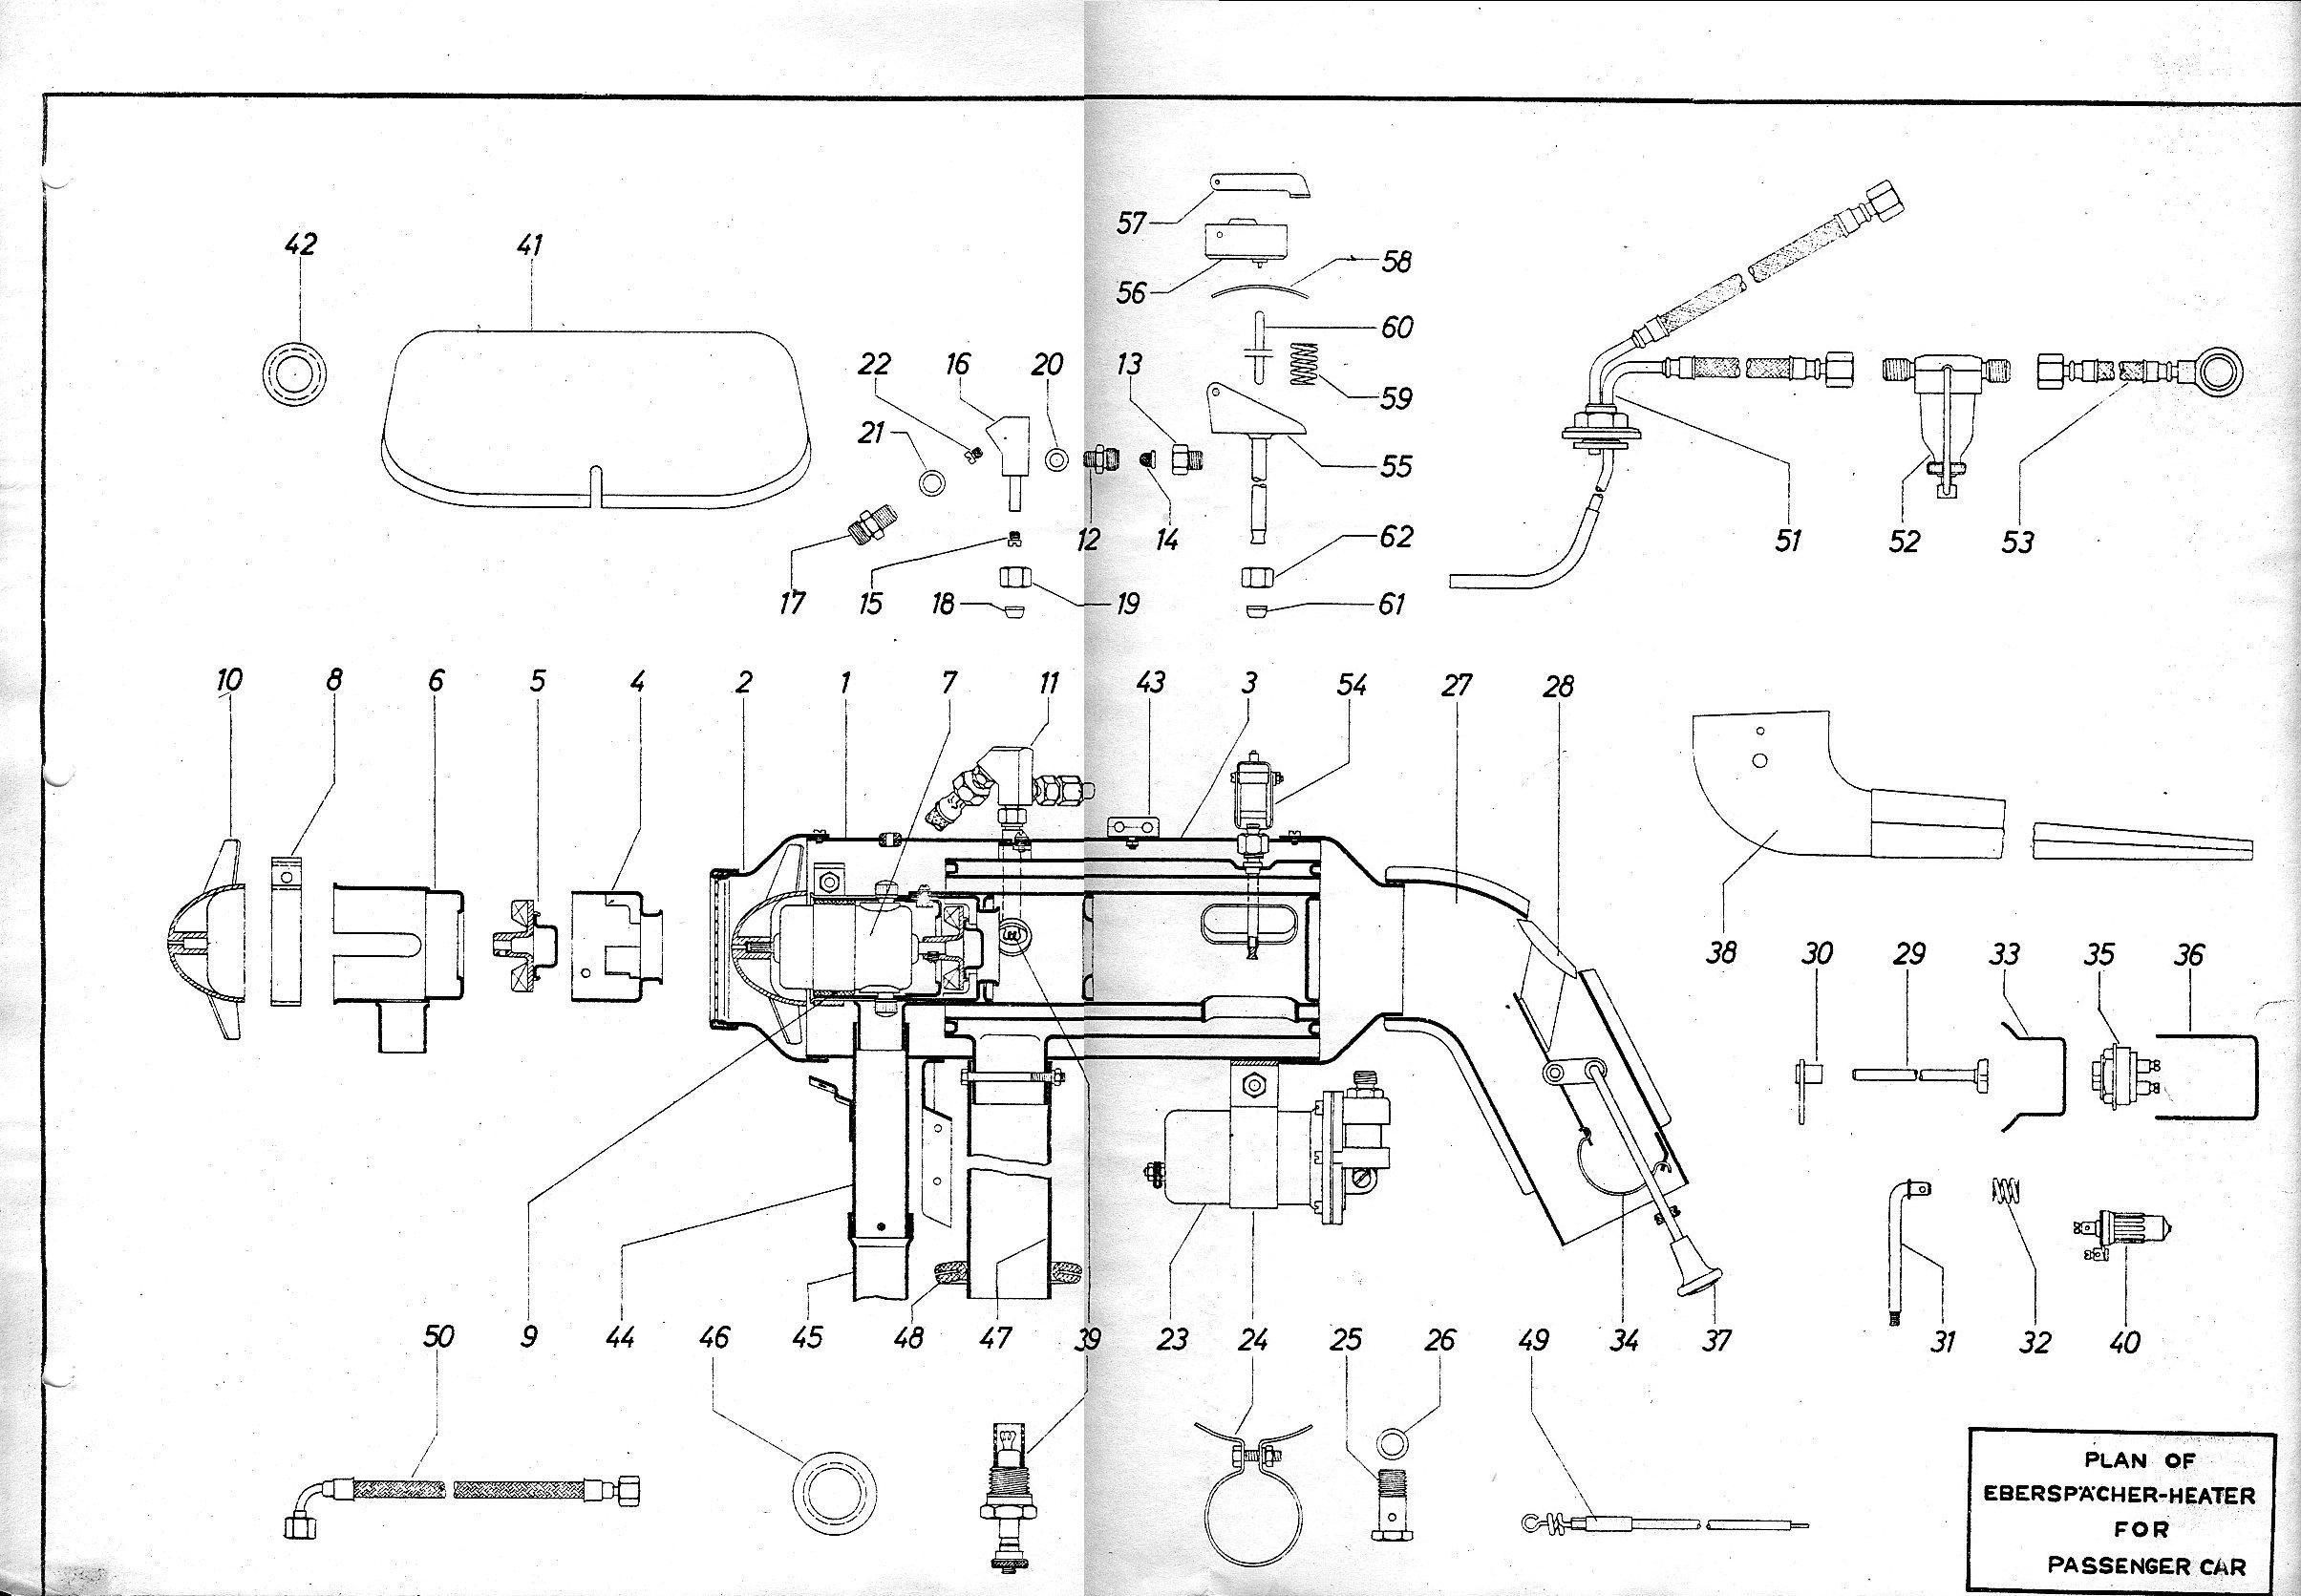 06 impala stereo wiring diagram